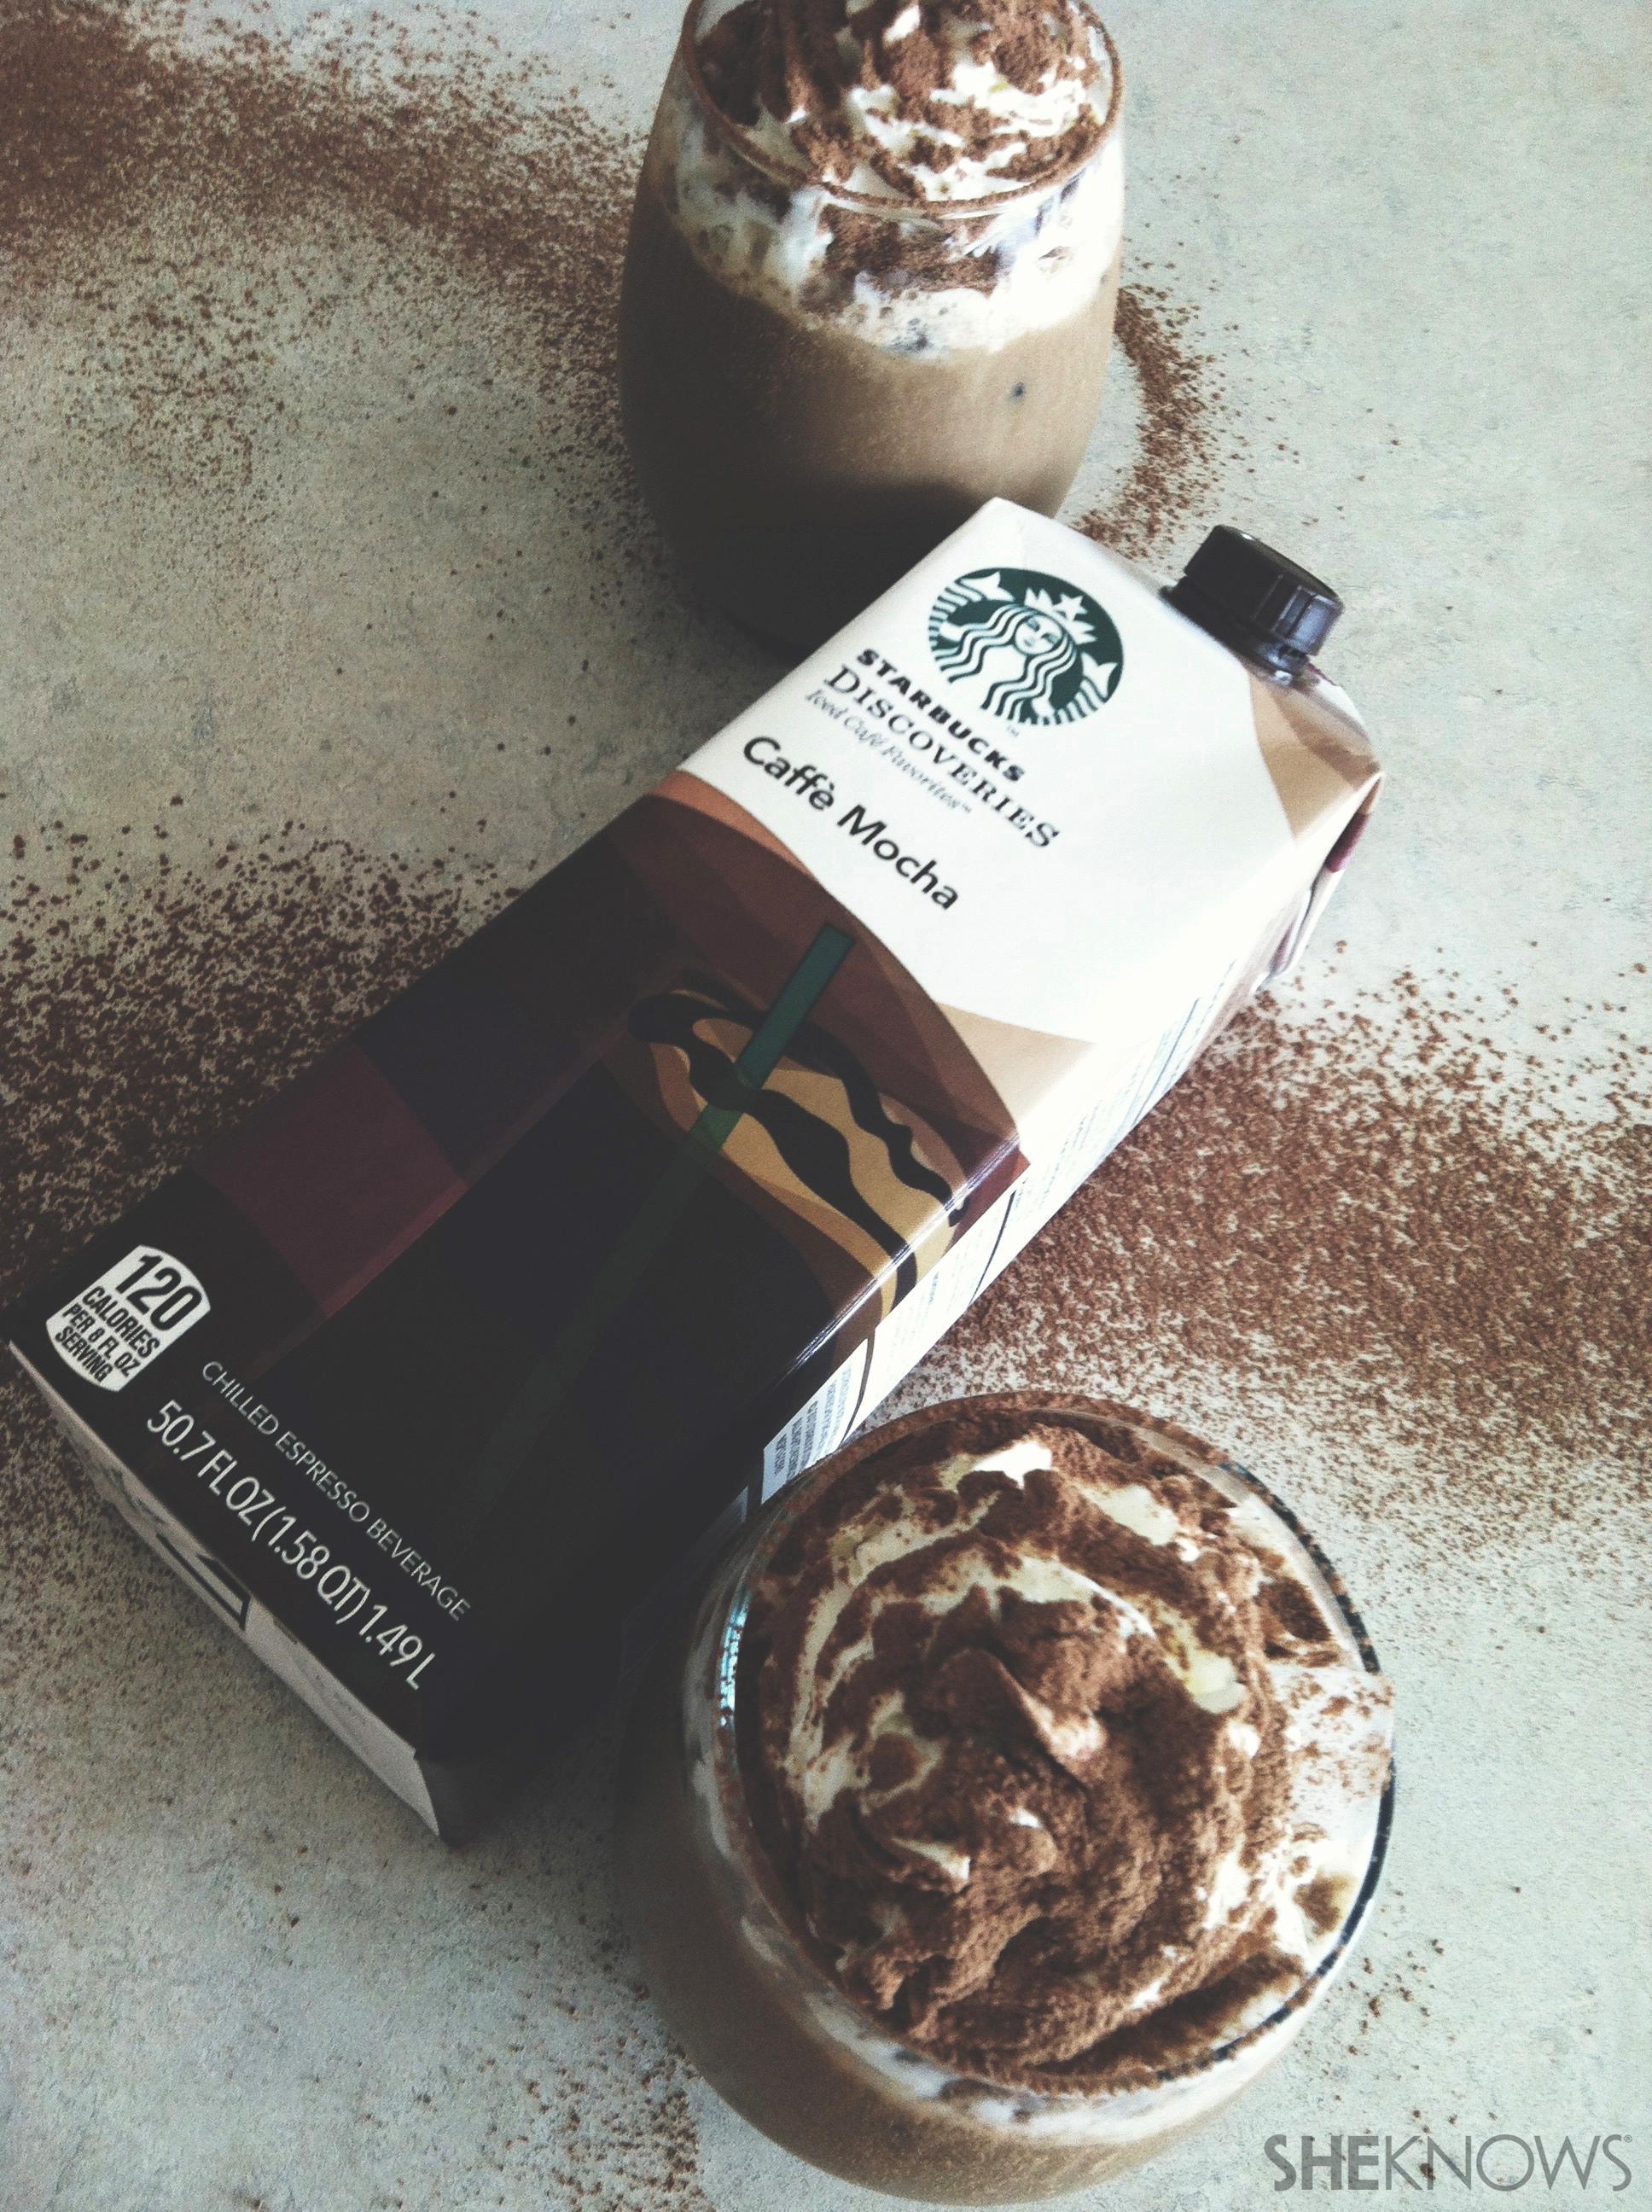 Starbucks Discoveries | Sheknows.com